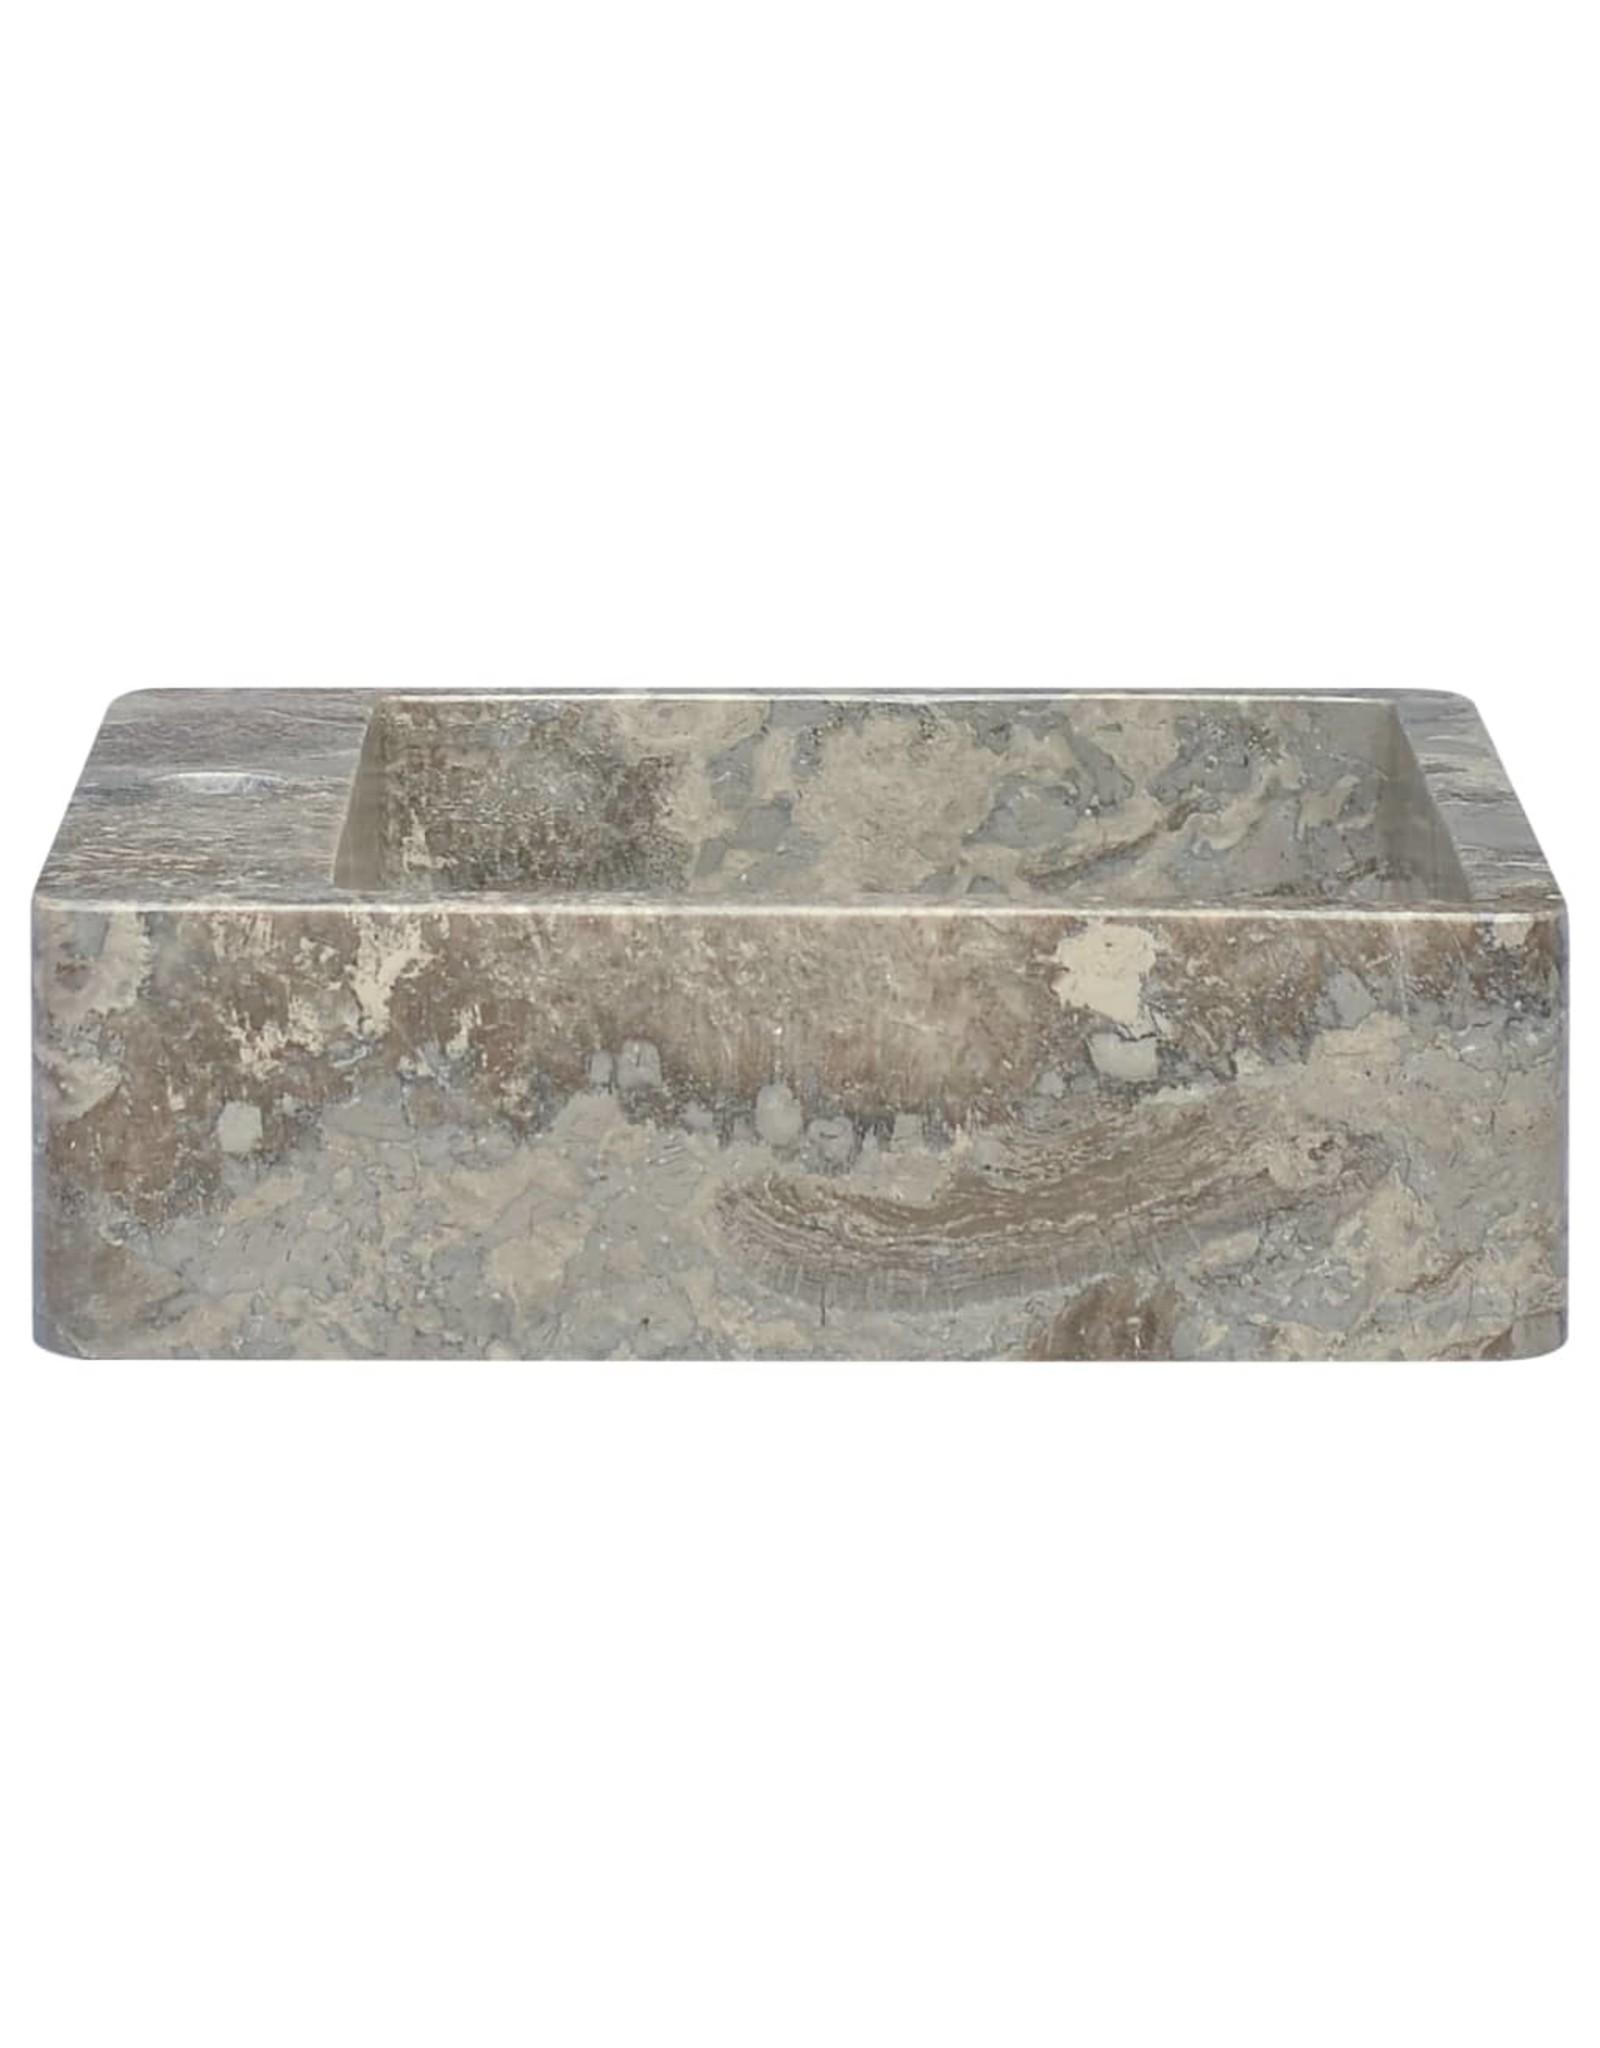 Gootsteen 40x40x12 cm marmer grijs